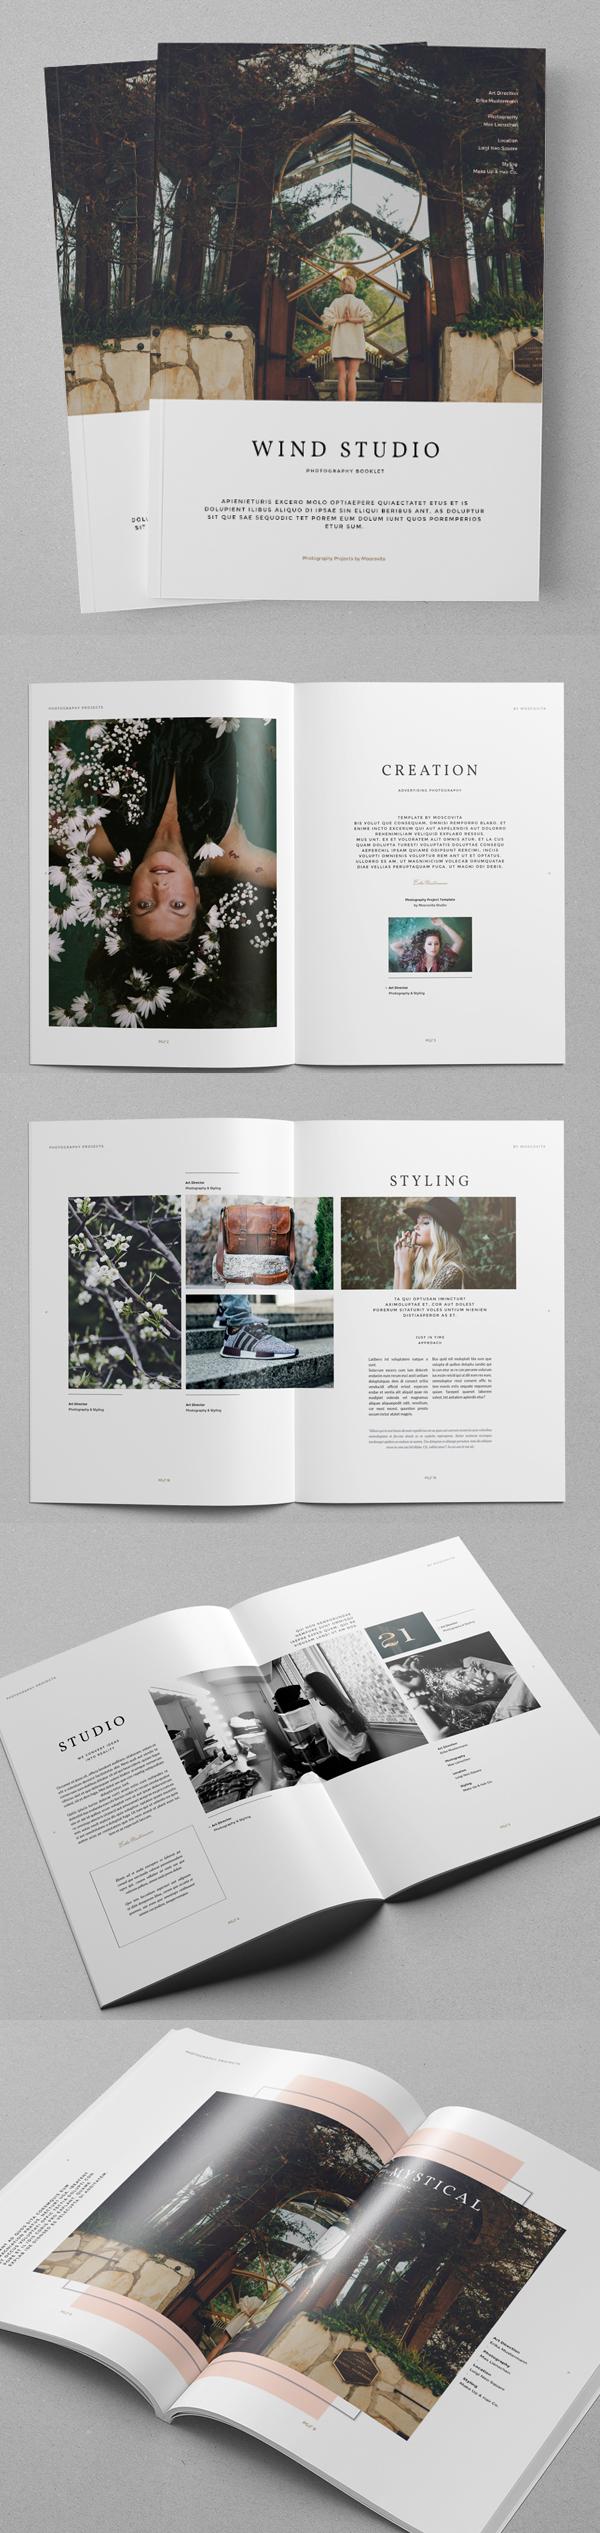 100 Professional Corporate Brochure Templates - 9